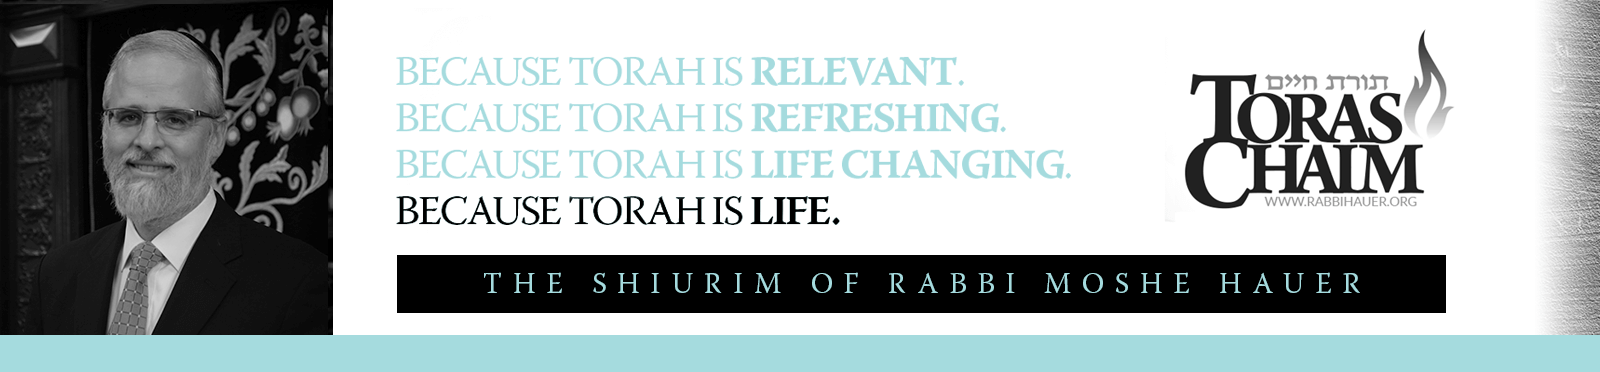 Toras Chaim - The Shiur of Rabbi Moshe Hauer